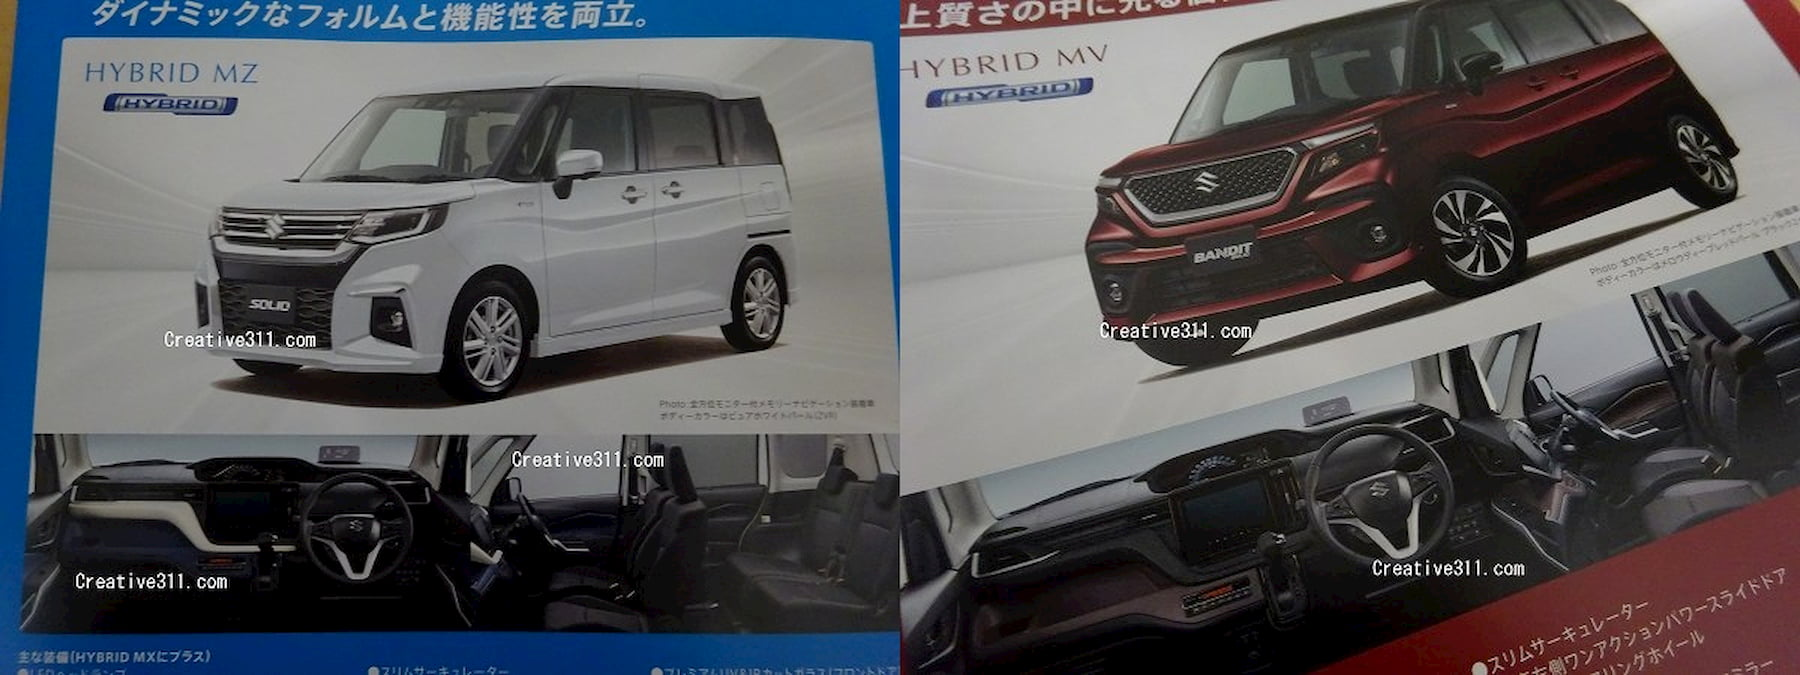 2021 Suzuki Solio 2021 Suzuki Bandit exterior interior